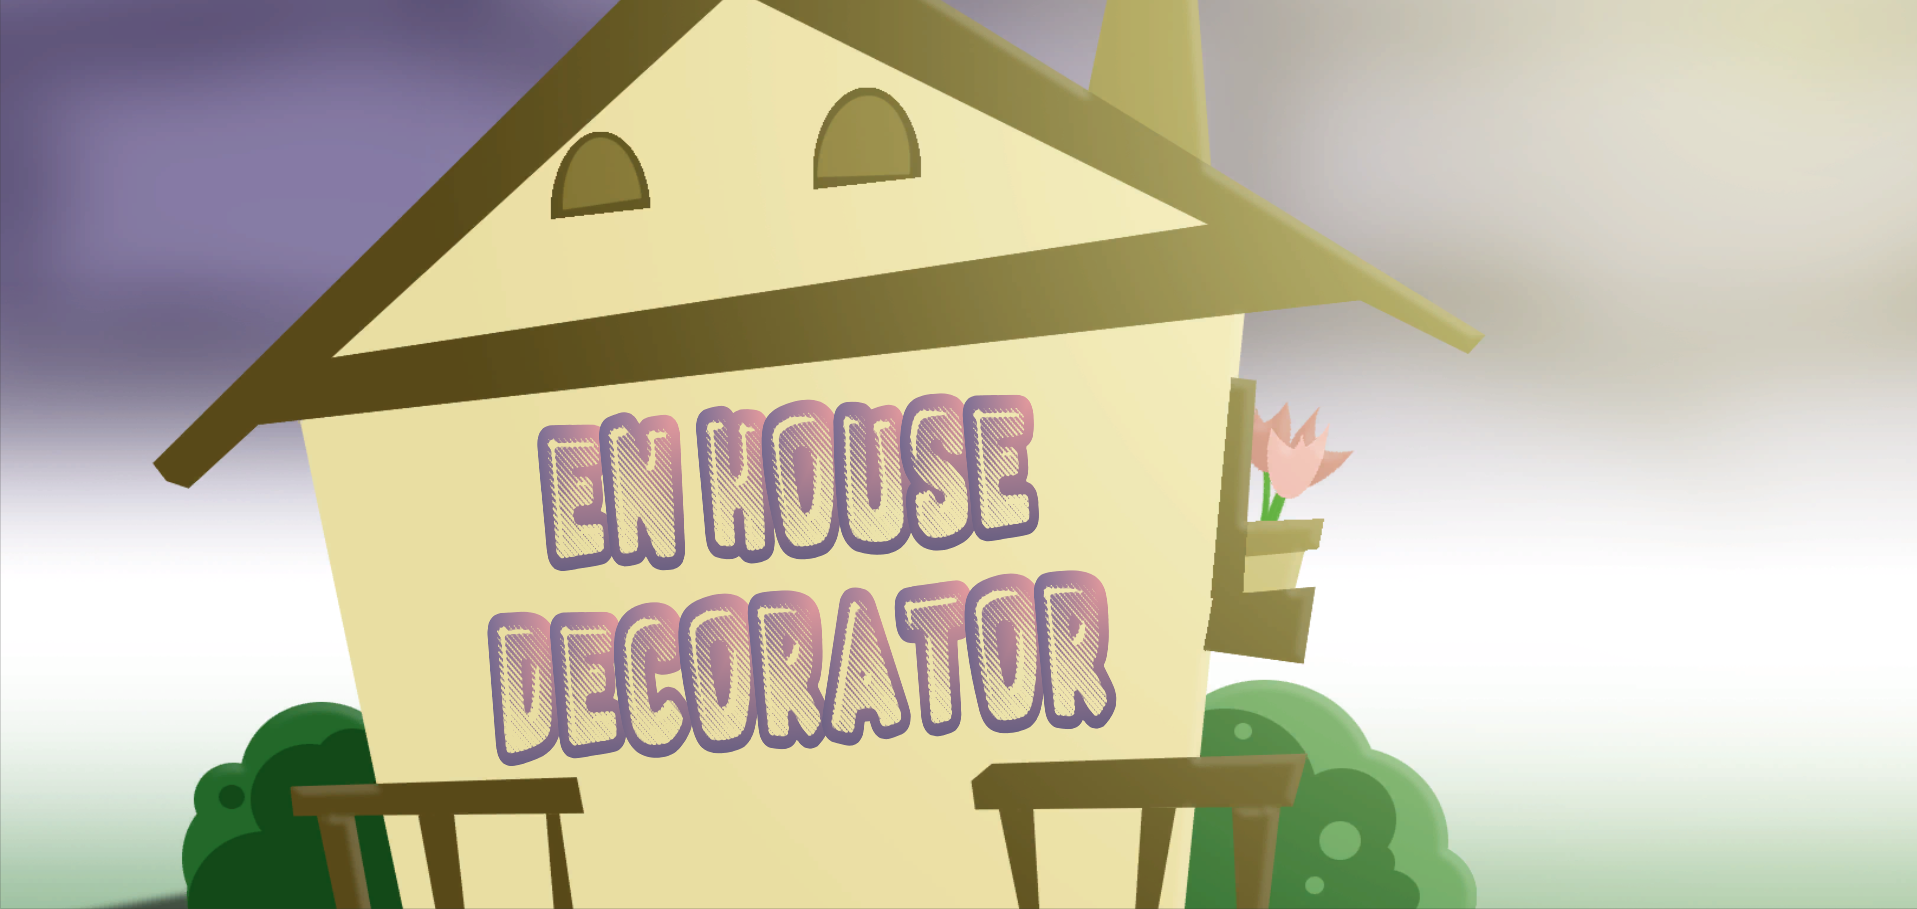 En House Decorator